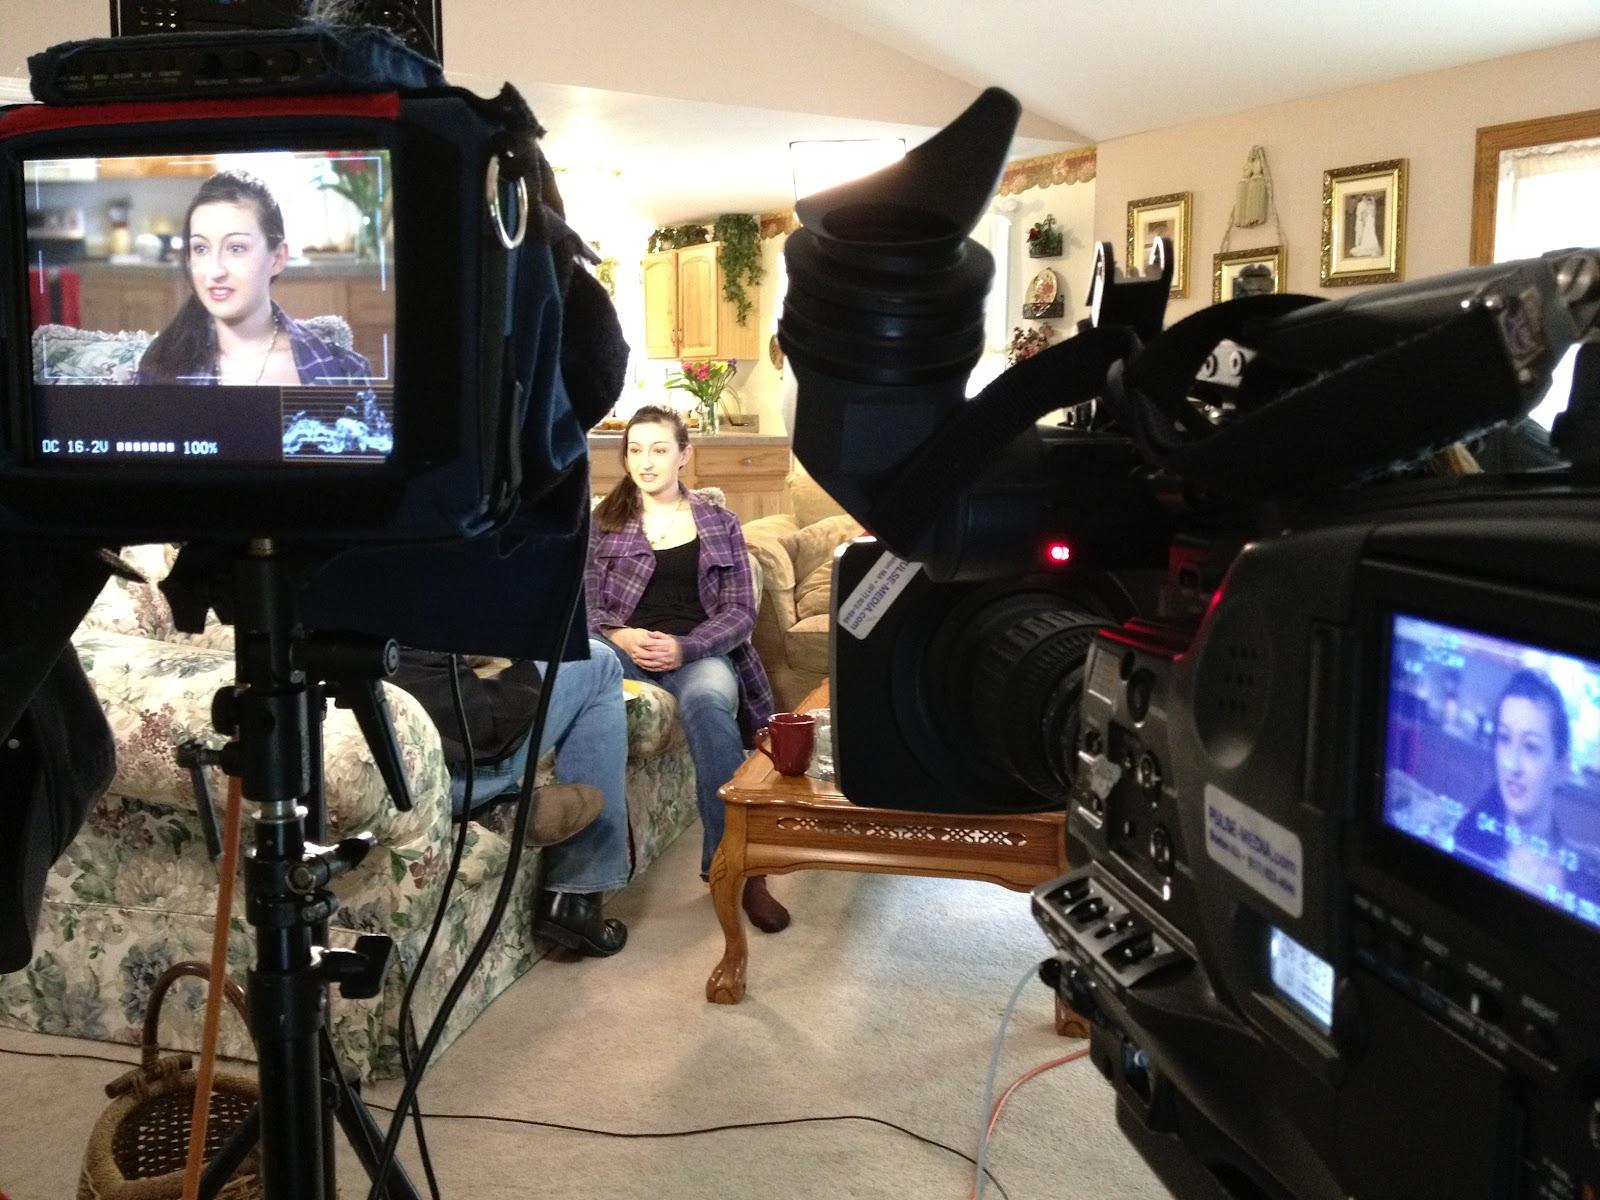 Elaina's Lyme Disease Story: Hired Camera Crew for 20/20